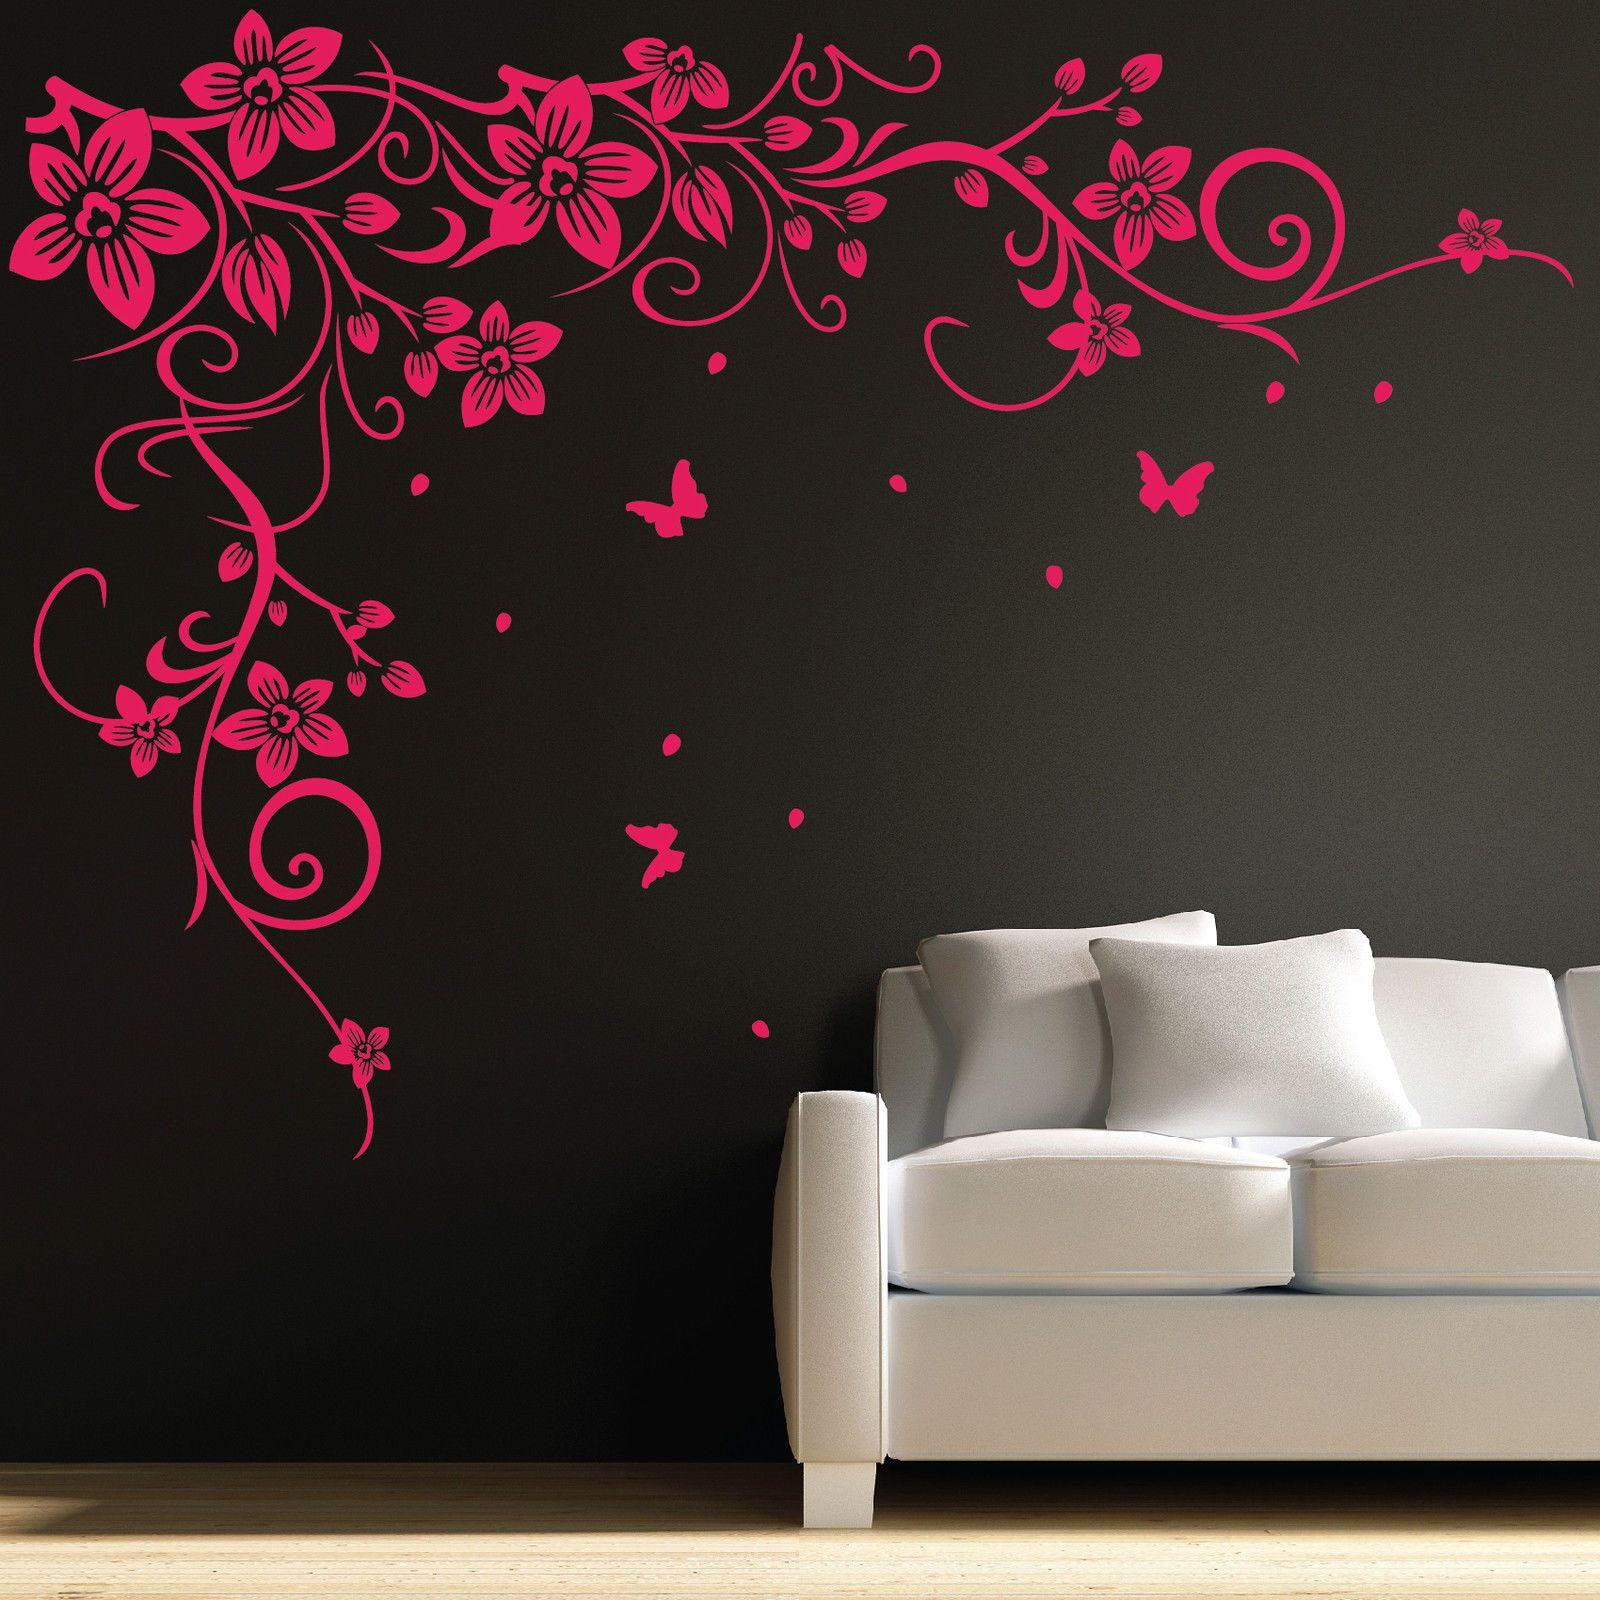 Butterfly Vine Flower Wall Art Stickers Decals 031 Buy